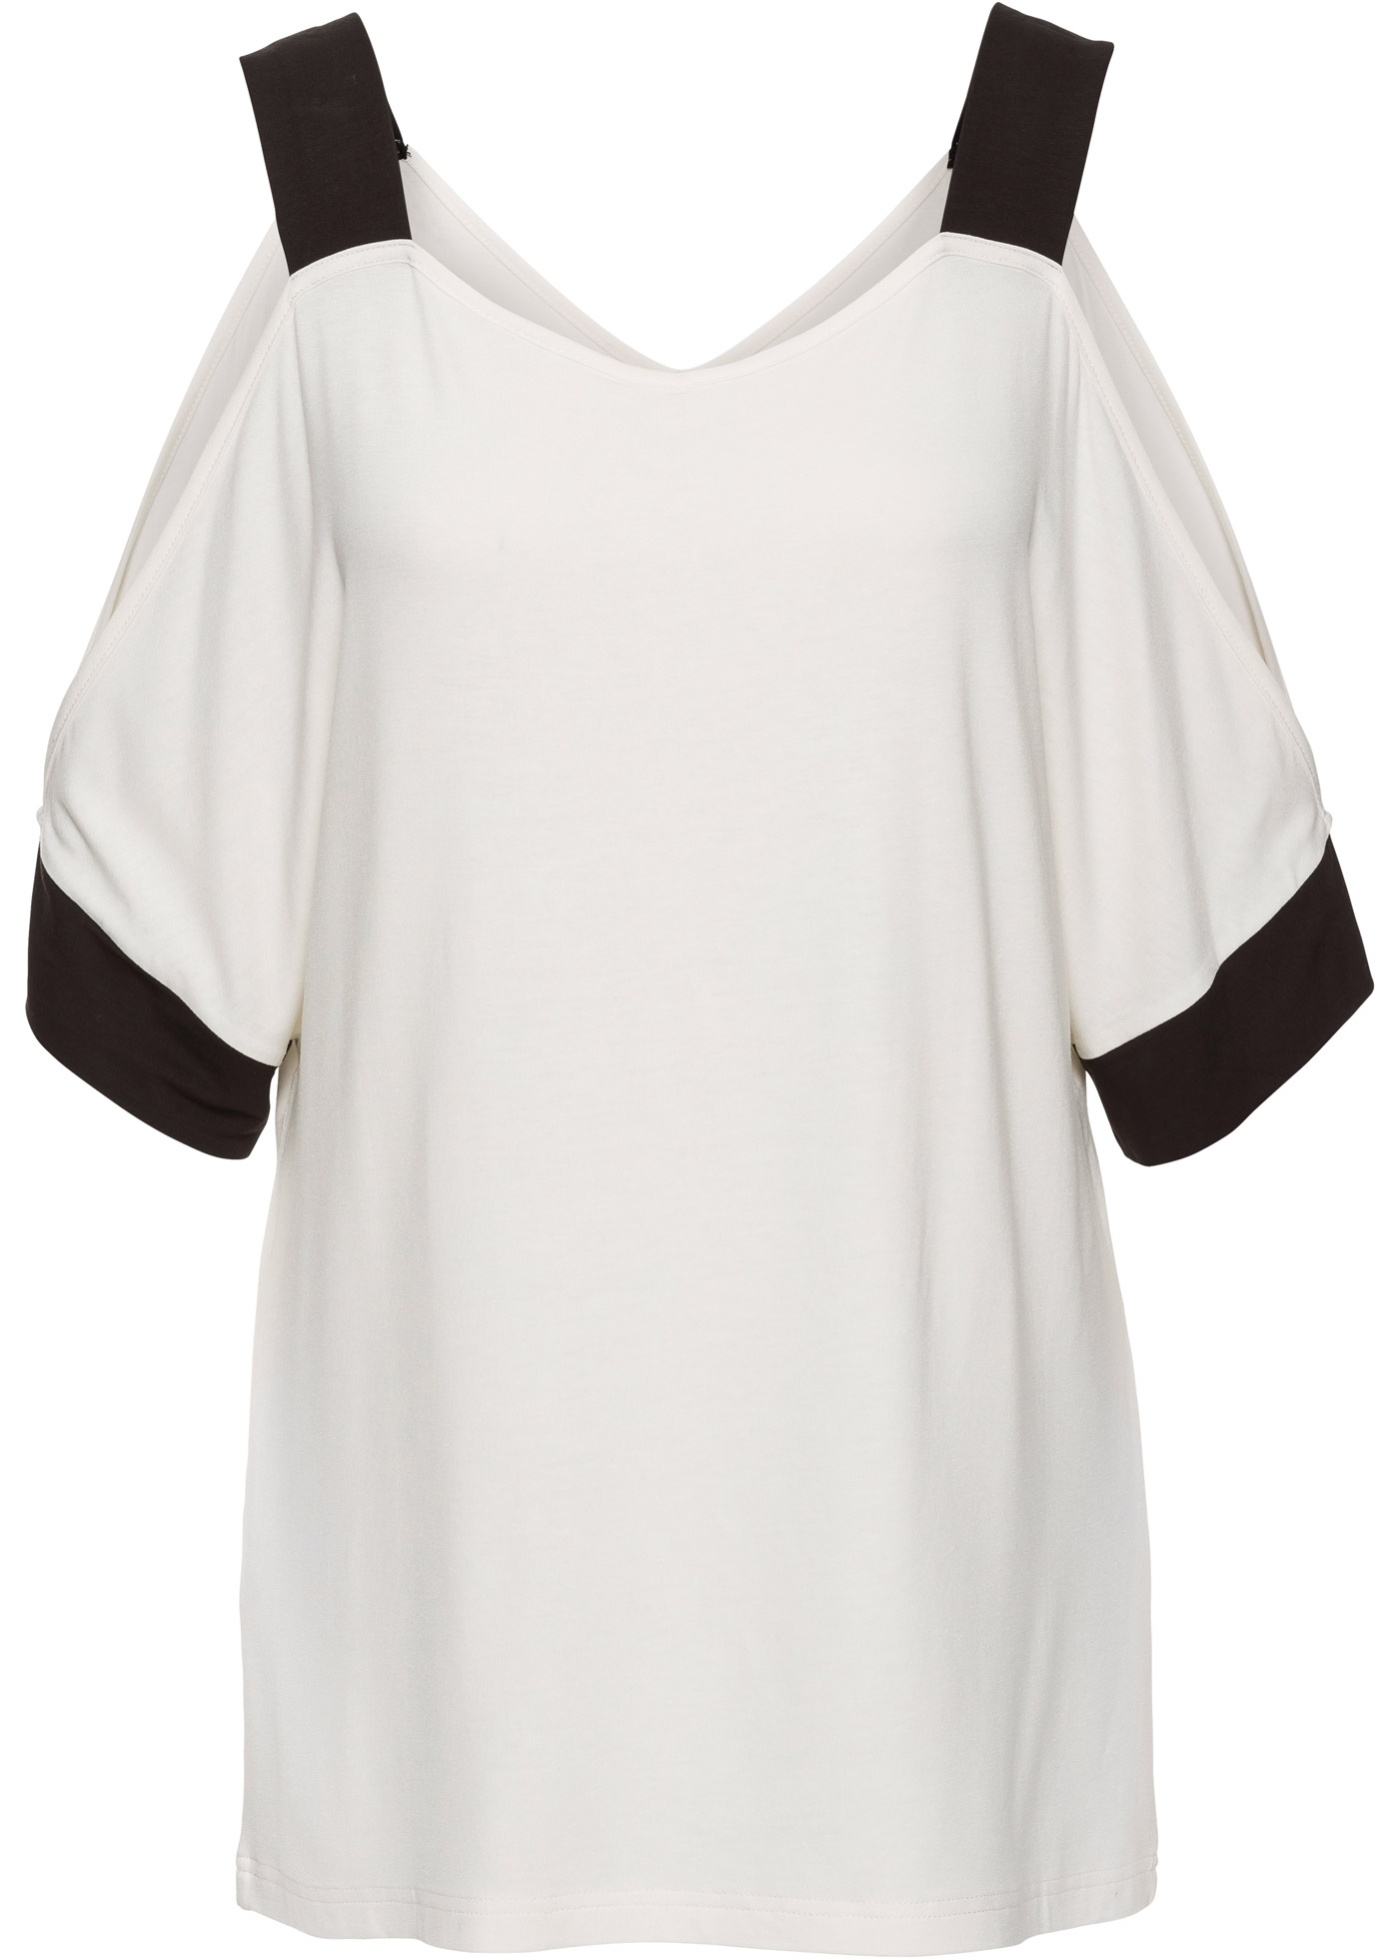 Bodyflirt Avec Femme BonprixT Blanc Découpes Manches Pour Mi shirt longues O0vmN8nw